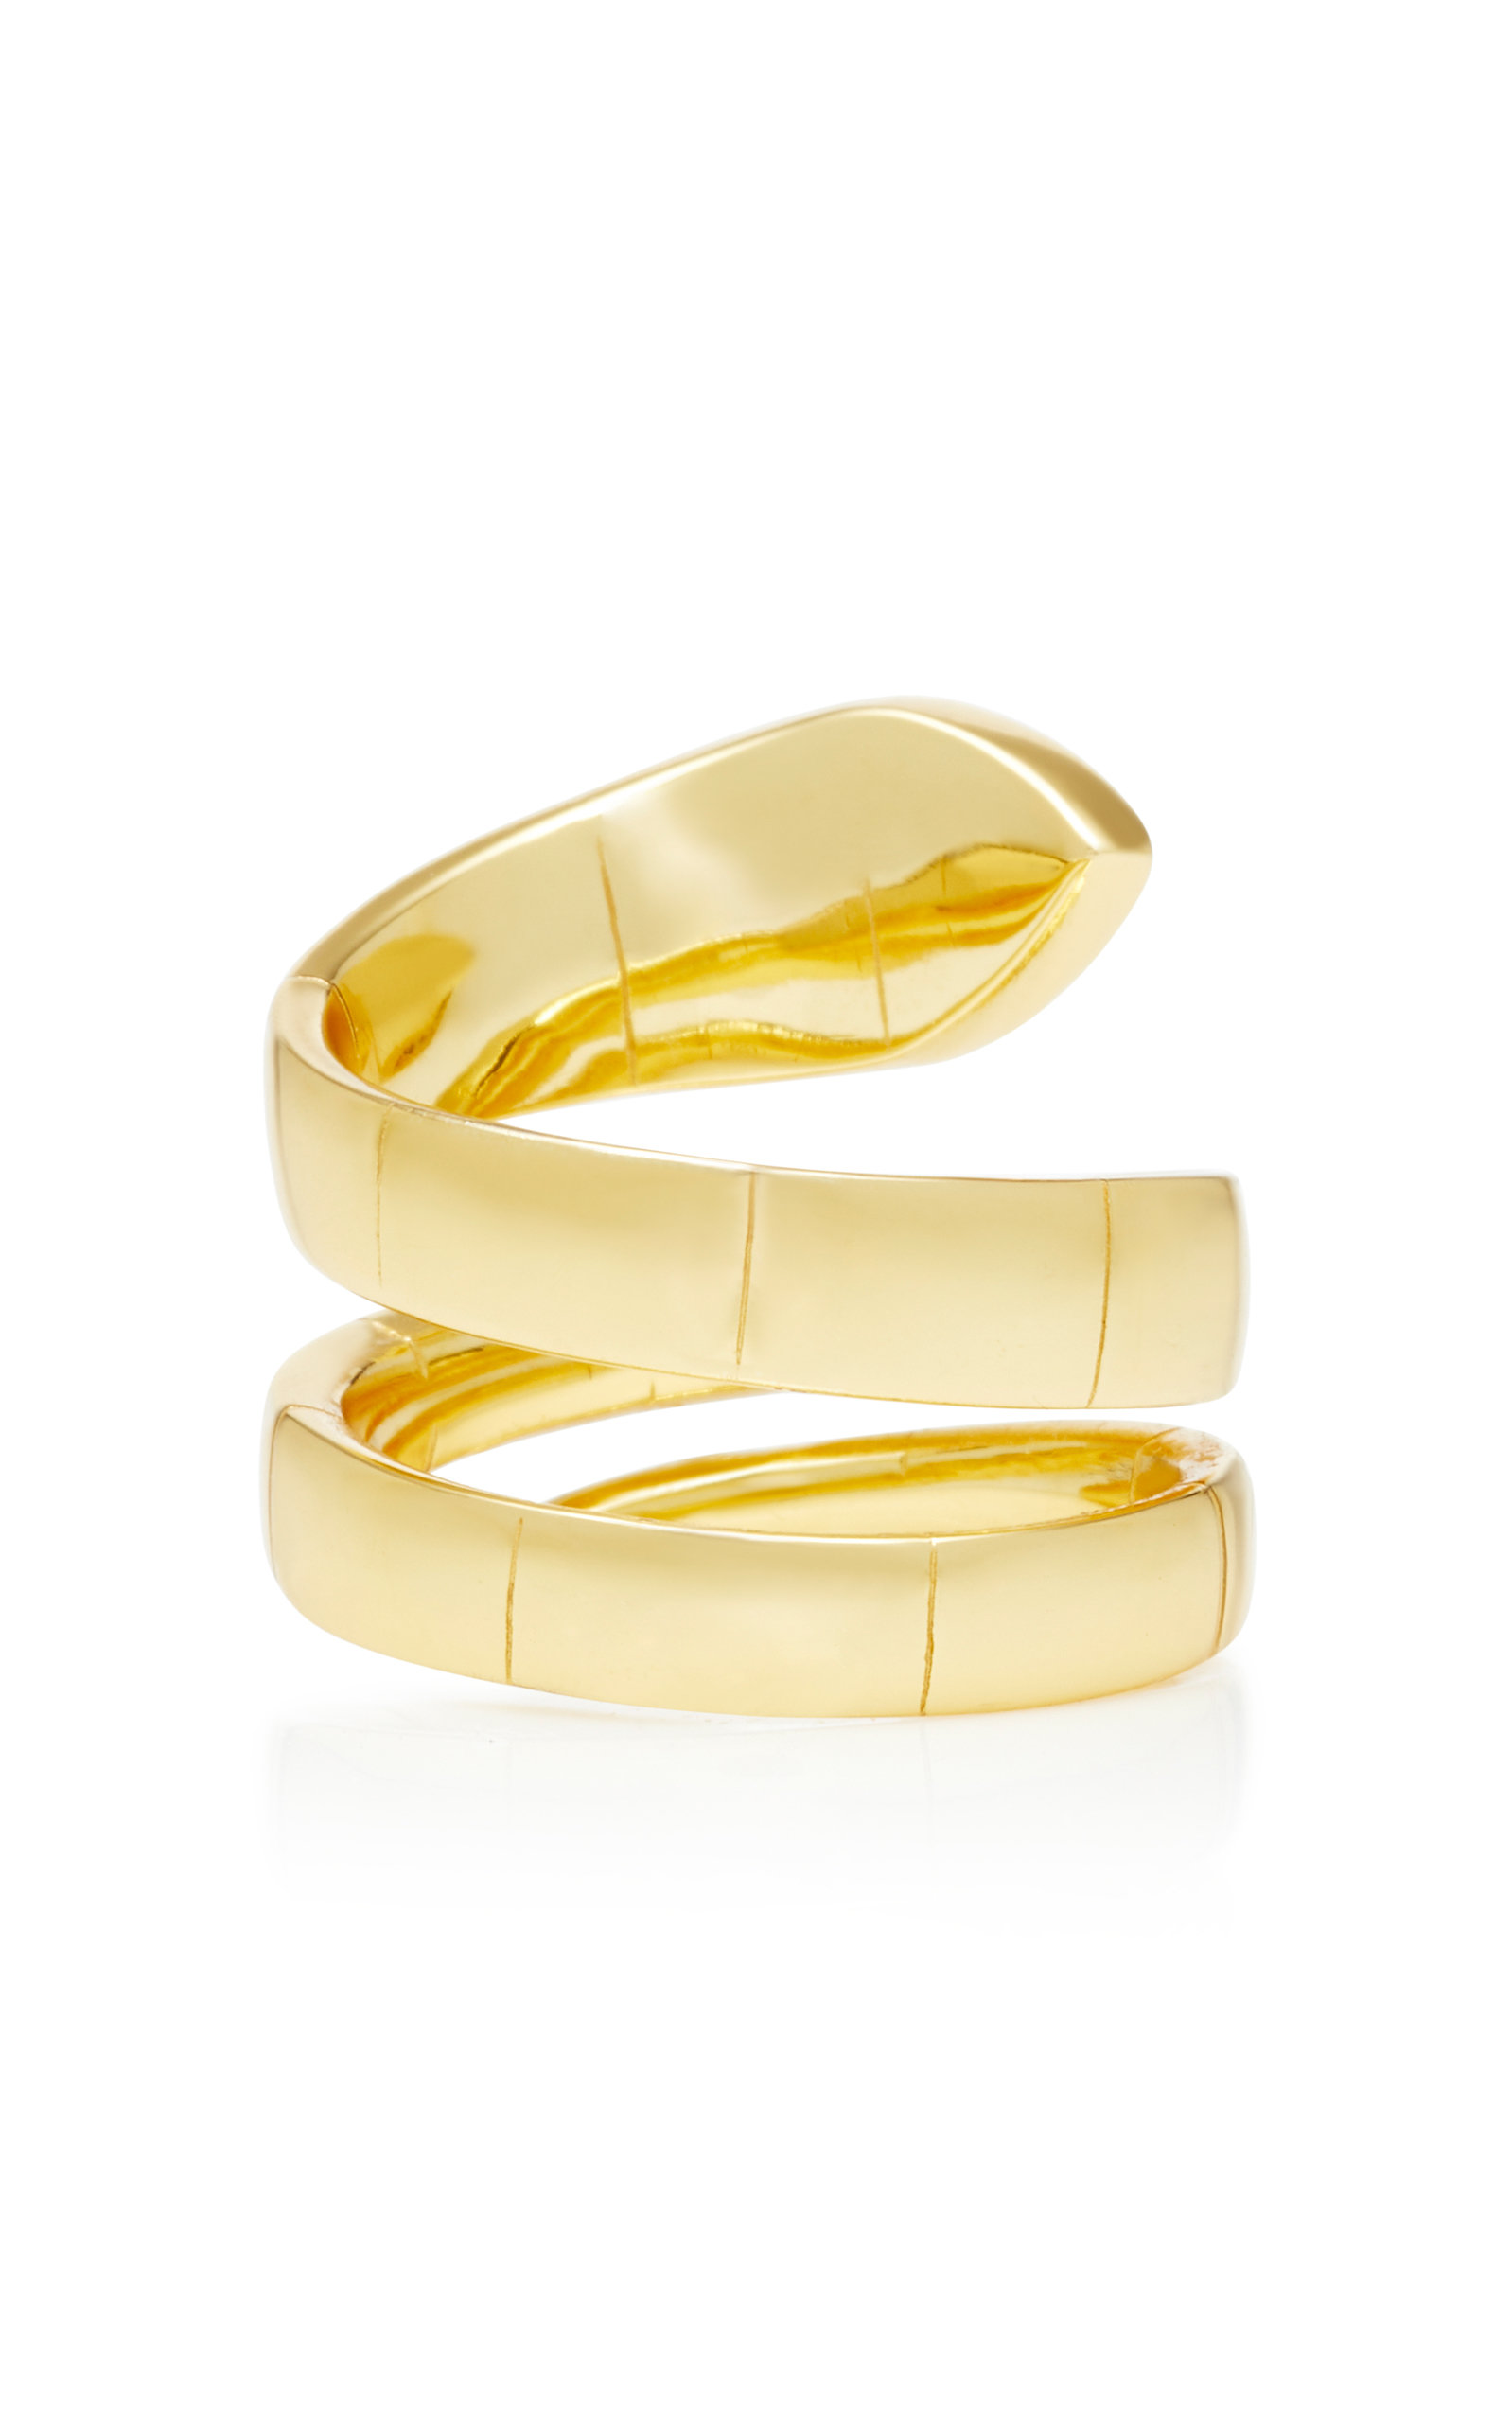 Wrap Gold-Plated Cubic Zirconia Ring Fallon Bj3iIsx1mC